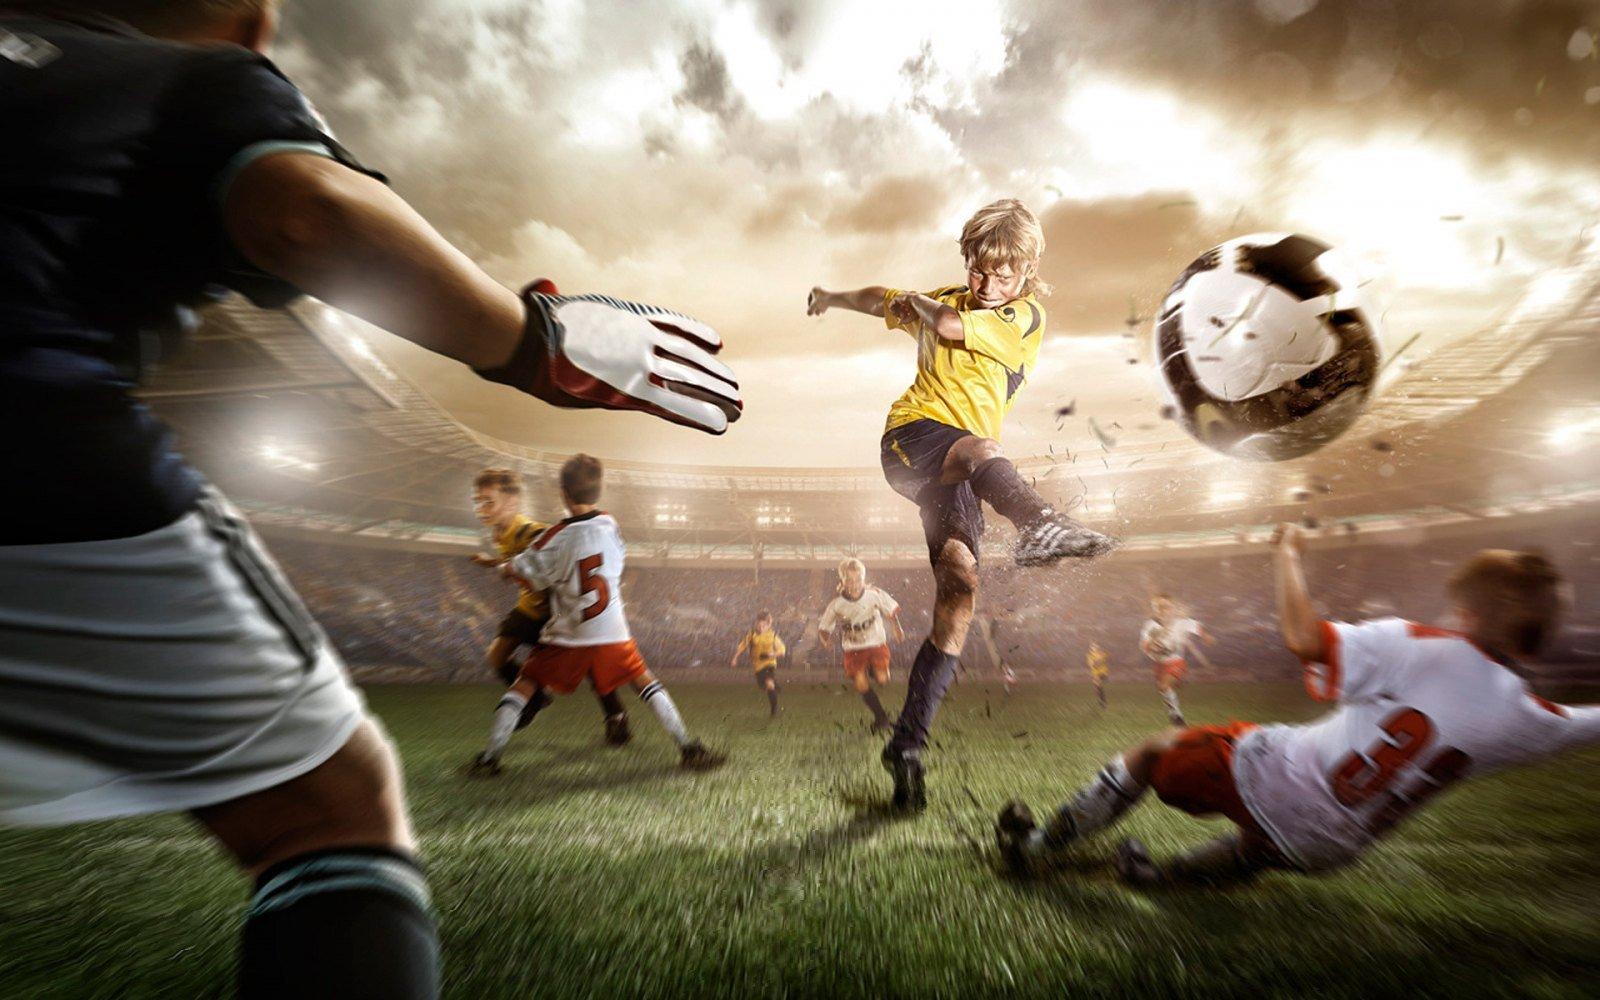 Futbol Yy Tumblr Www Miifotos Com